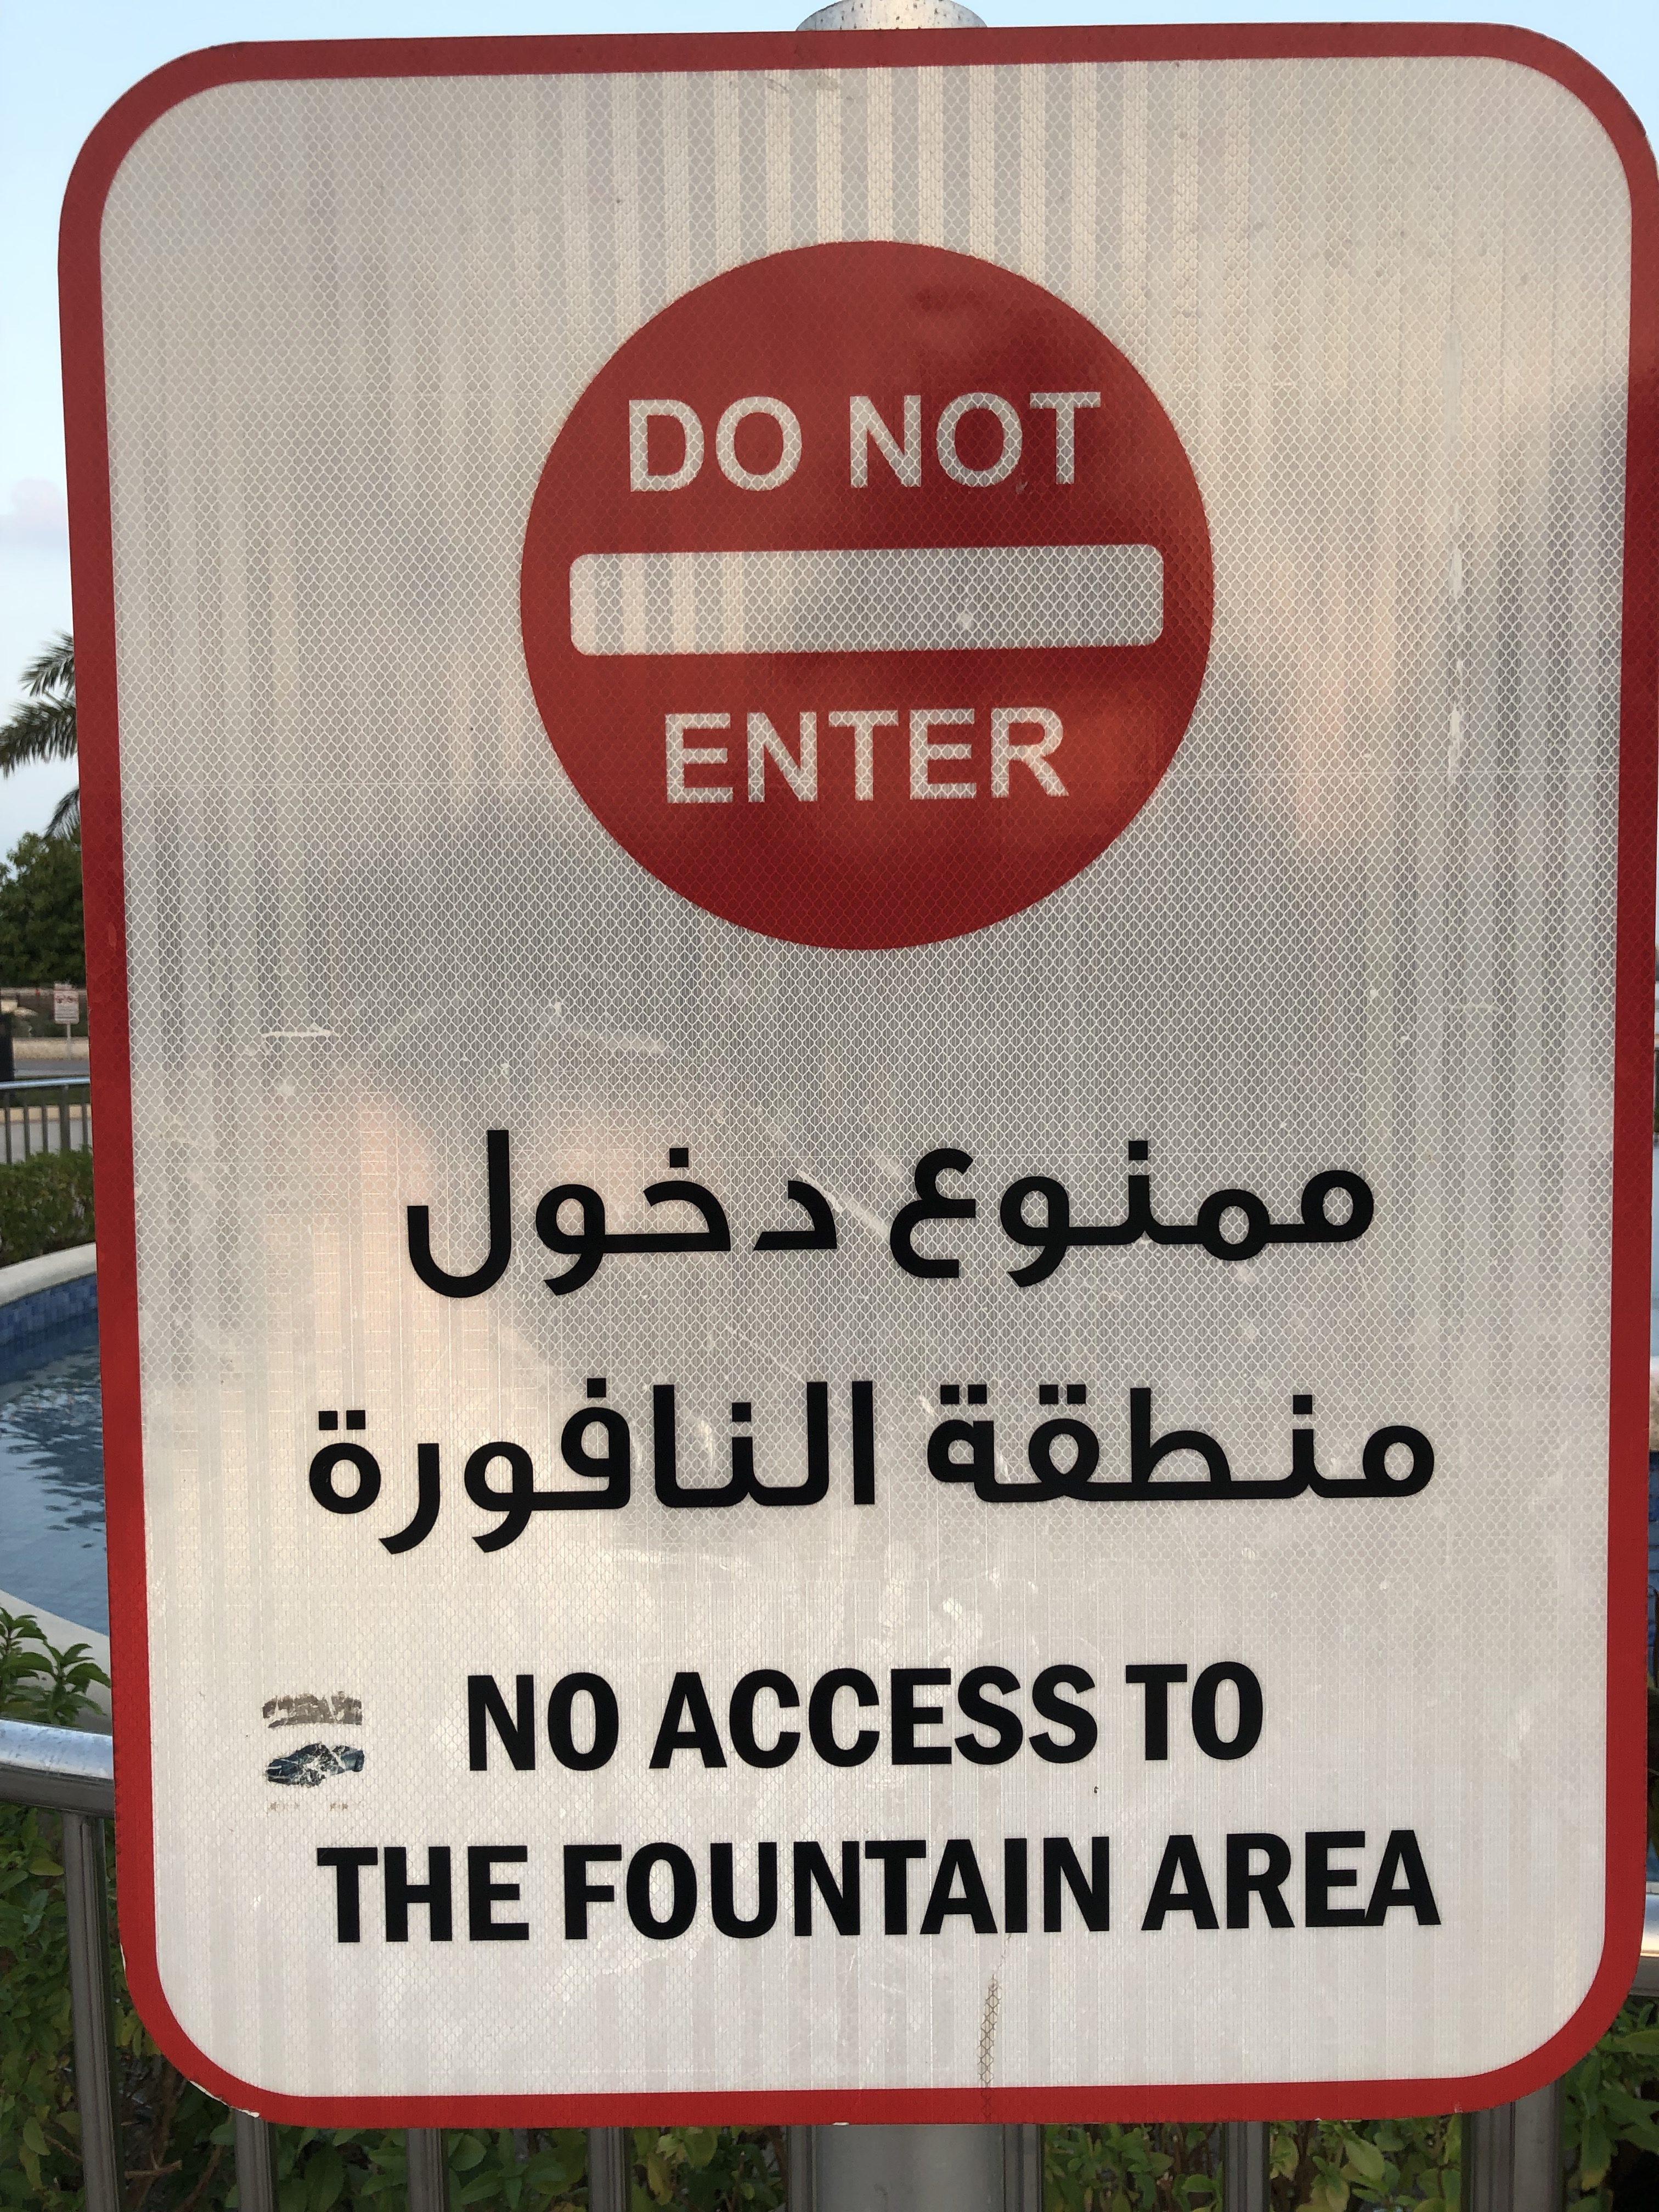 Fountain access ban